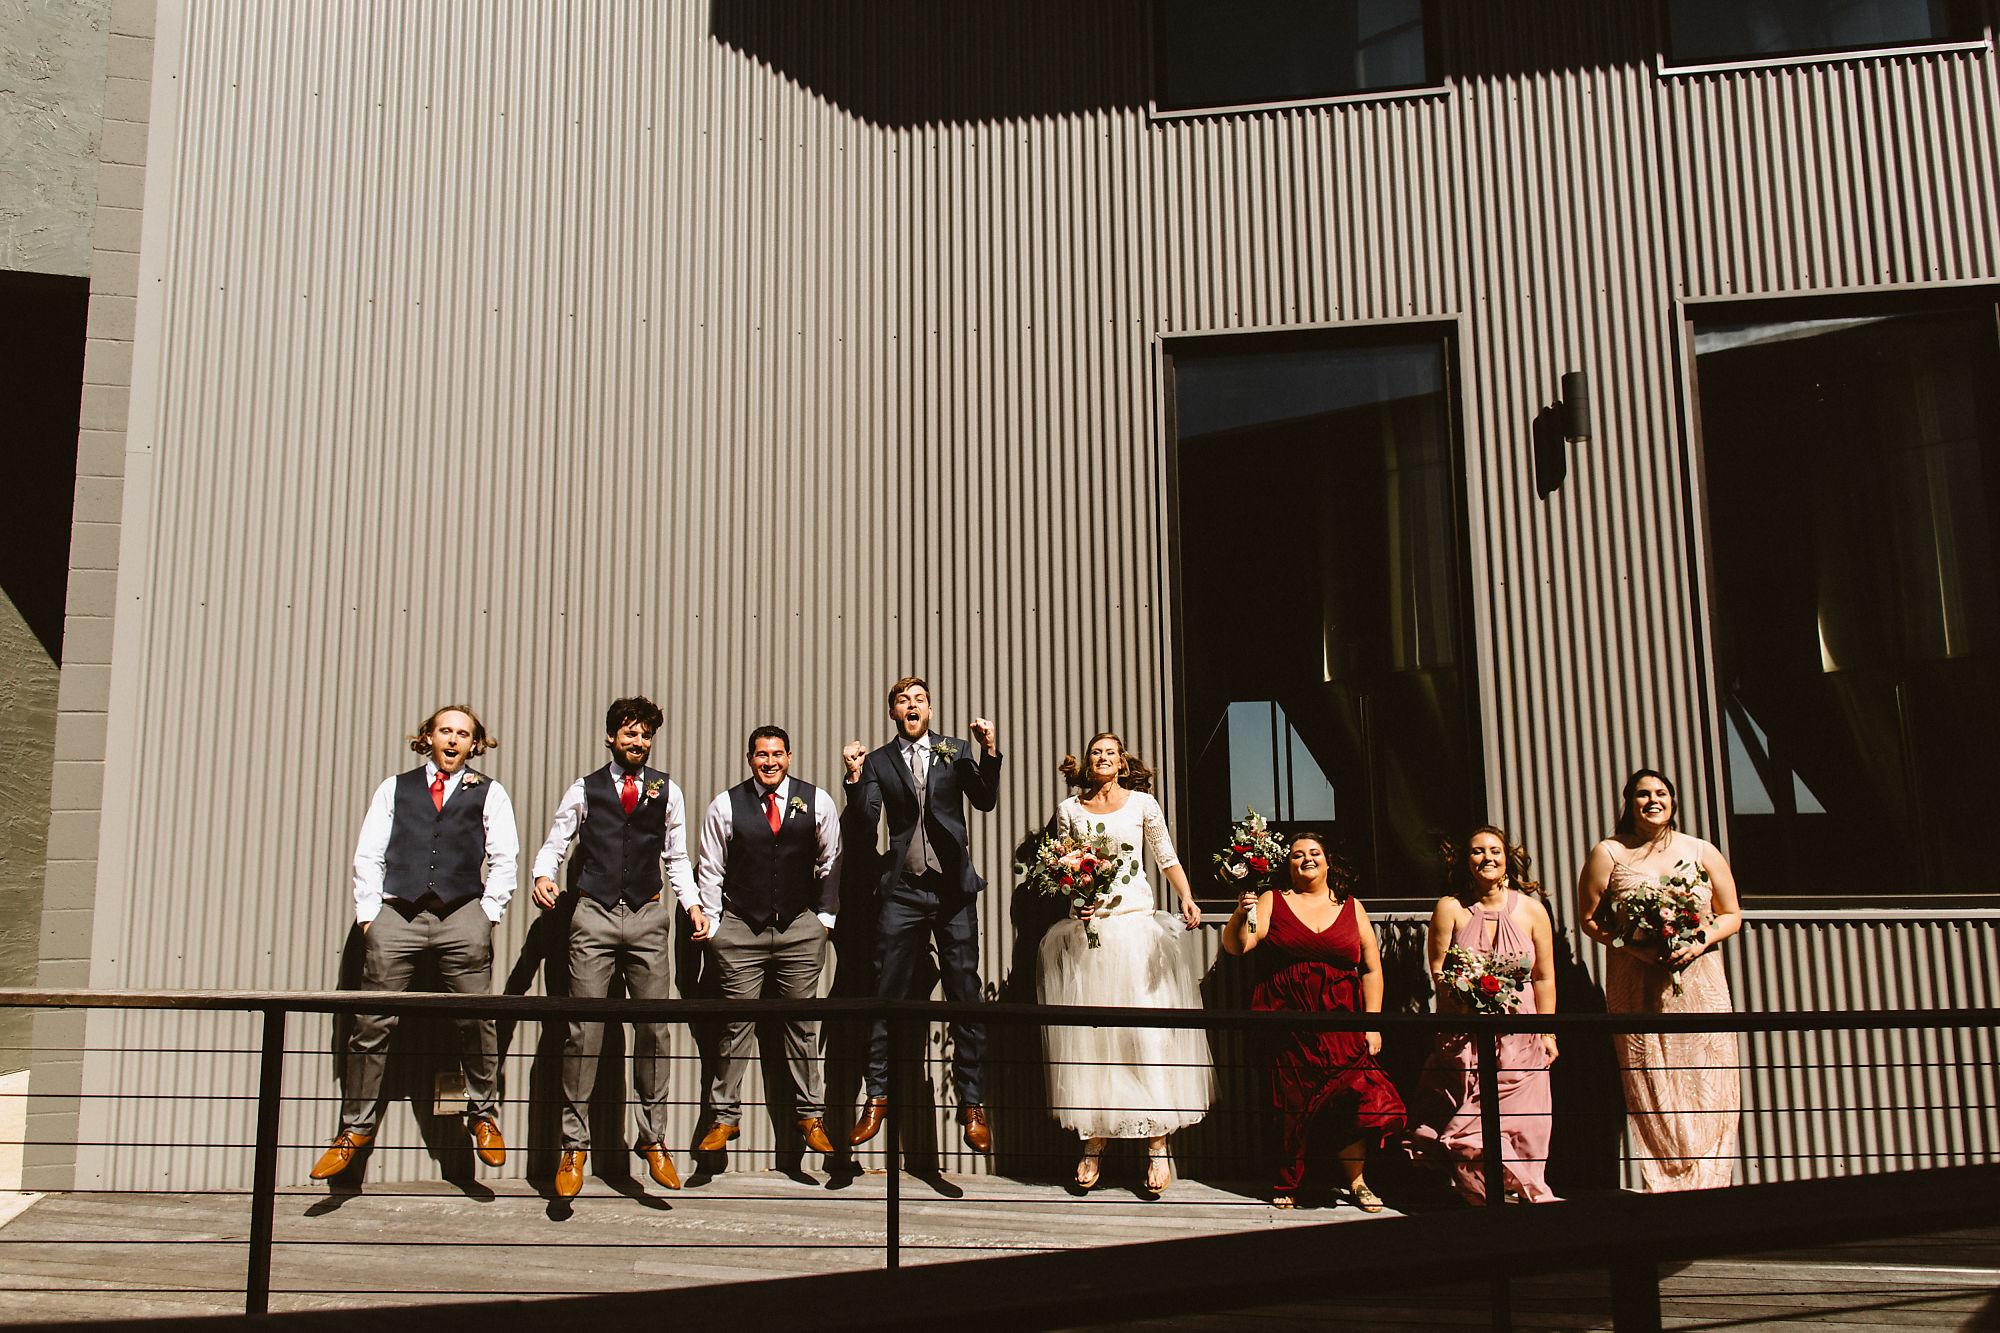 jessica_austin_oasis_brewery_wedding_photos132055.jpg